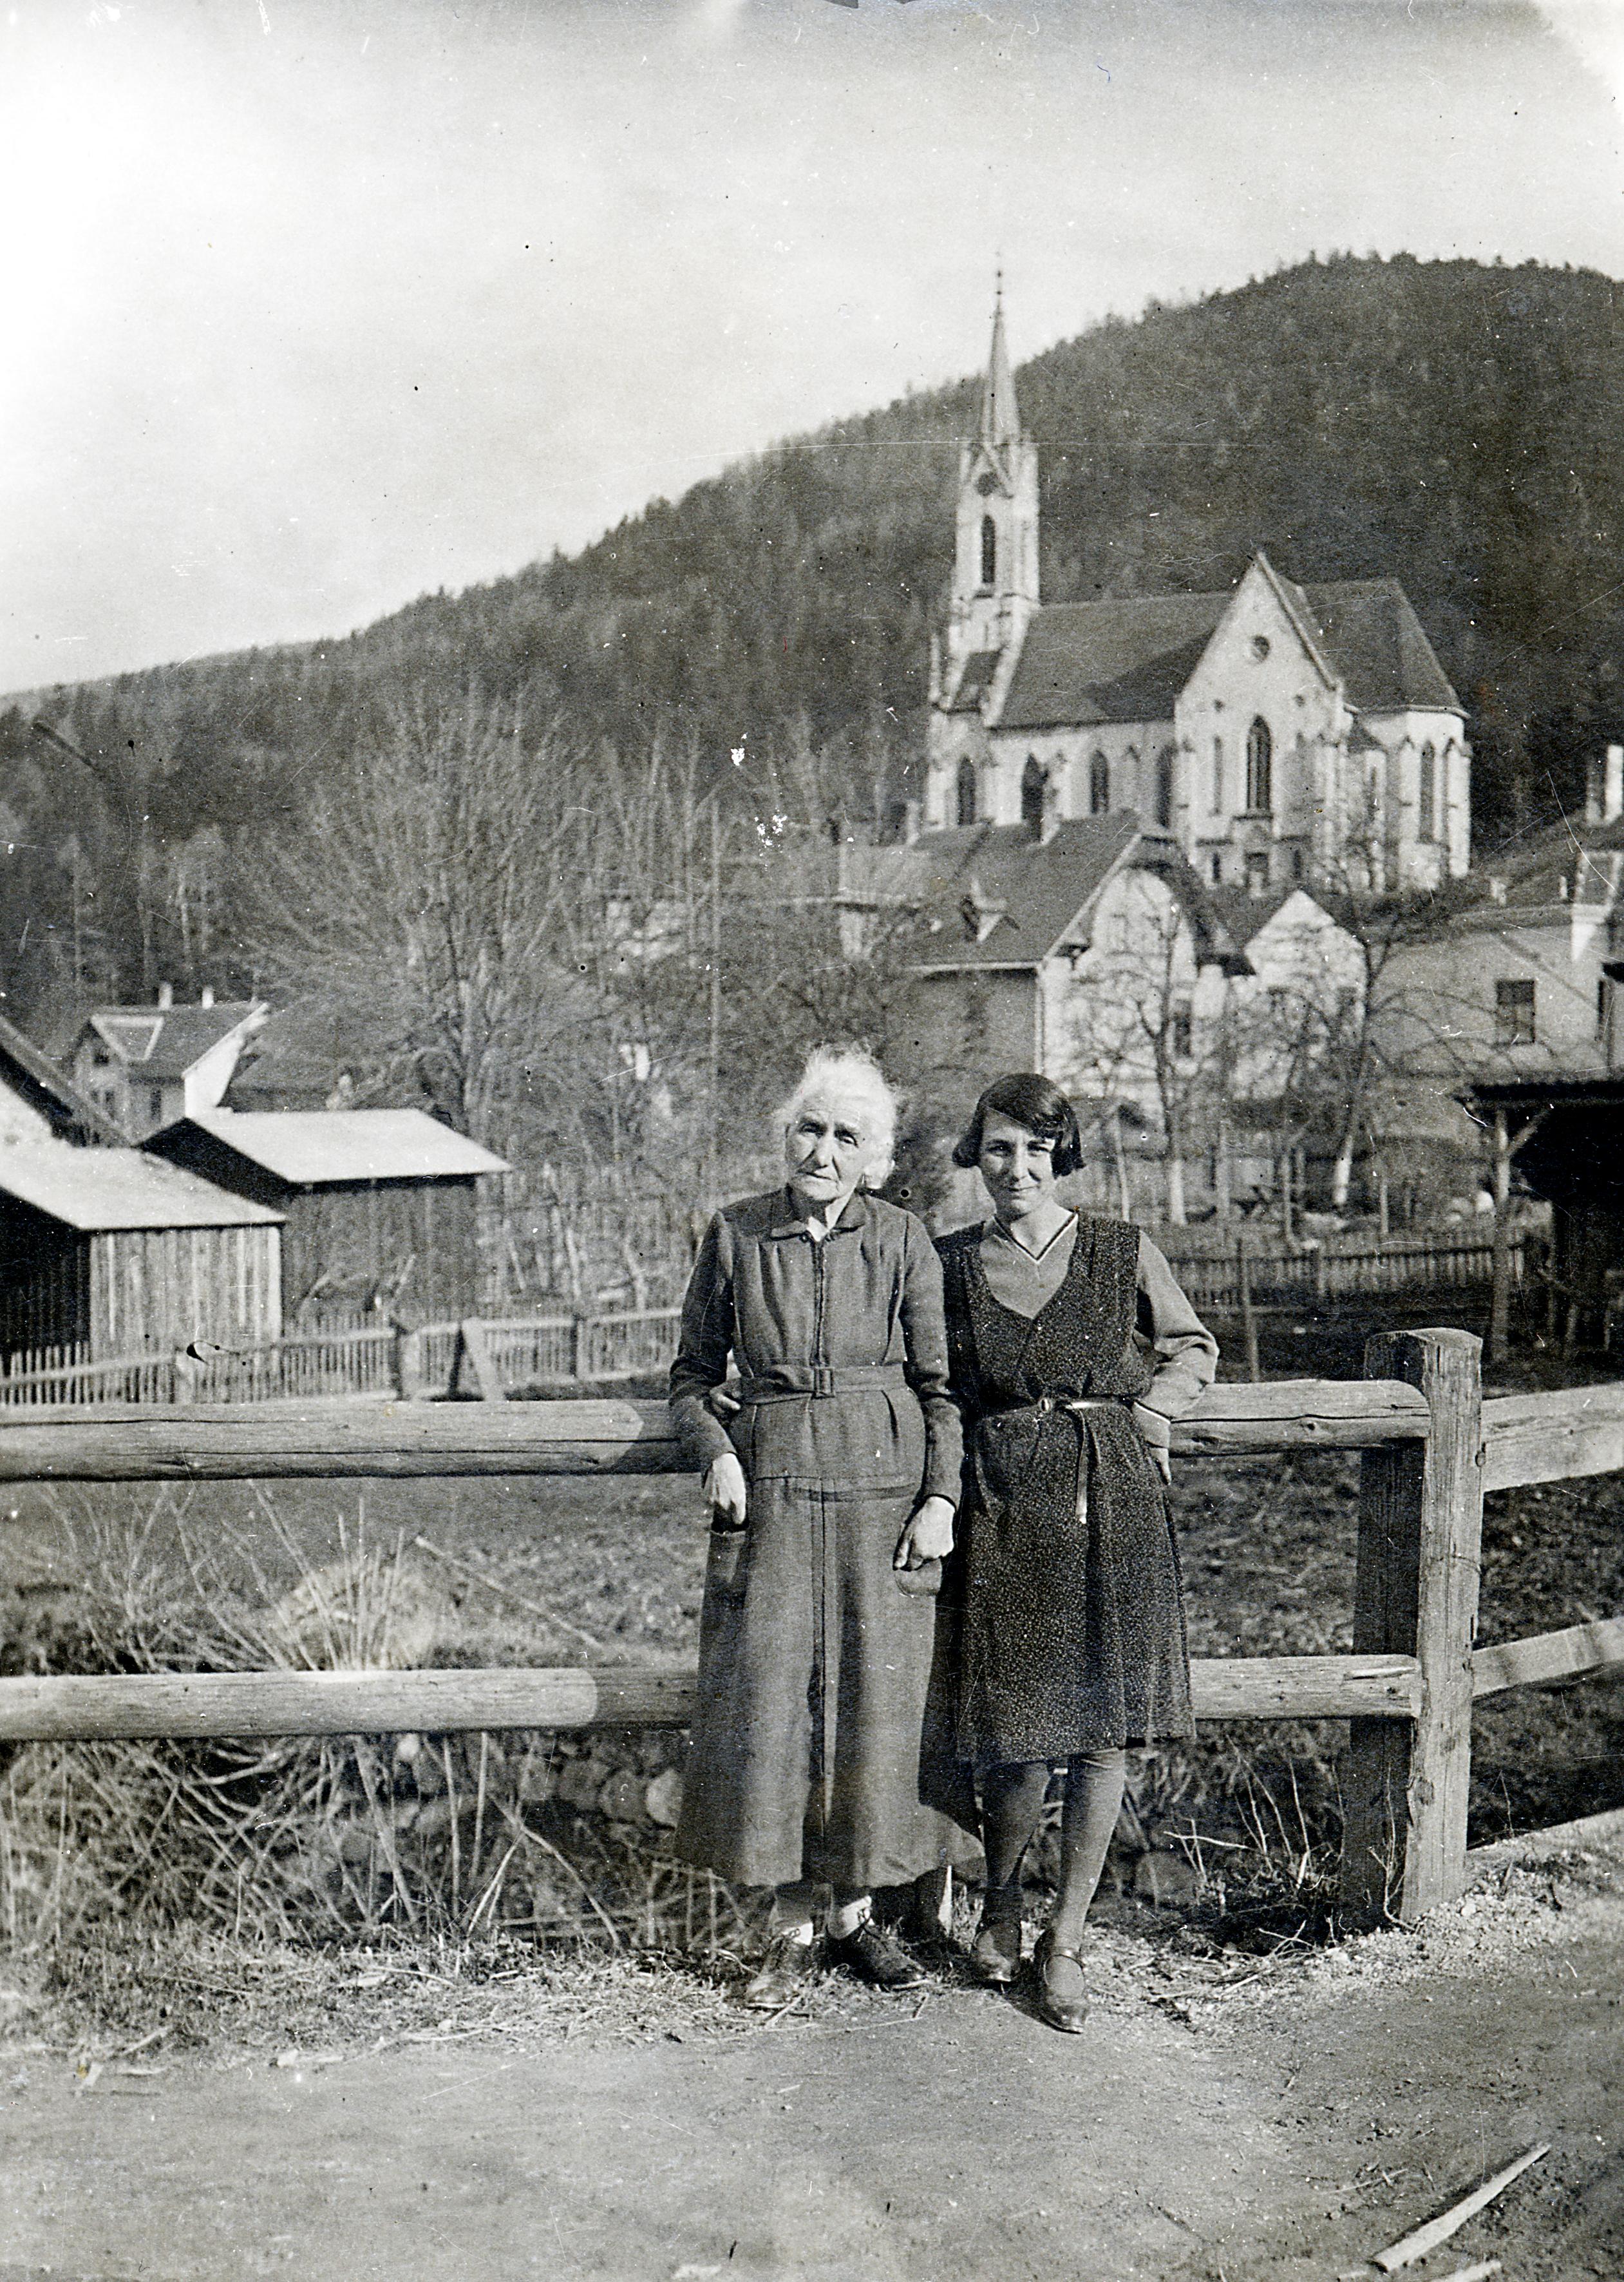 Lilli Tauber's grandmother, Sofie Friedmann, and her aunt, Berta Guenser, in Prein